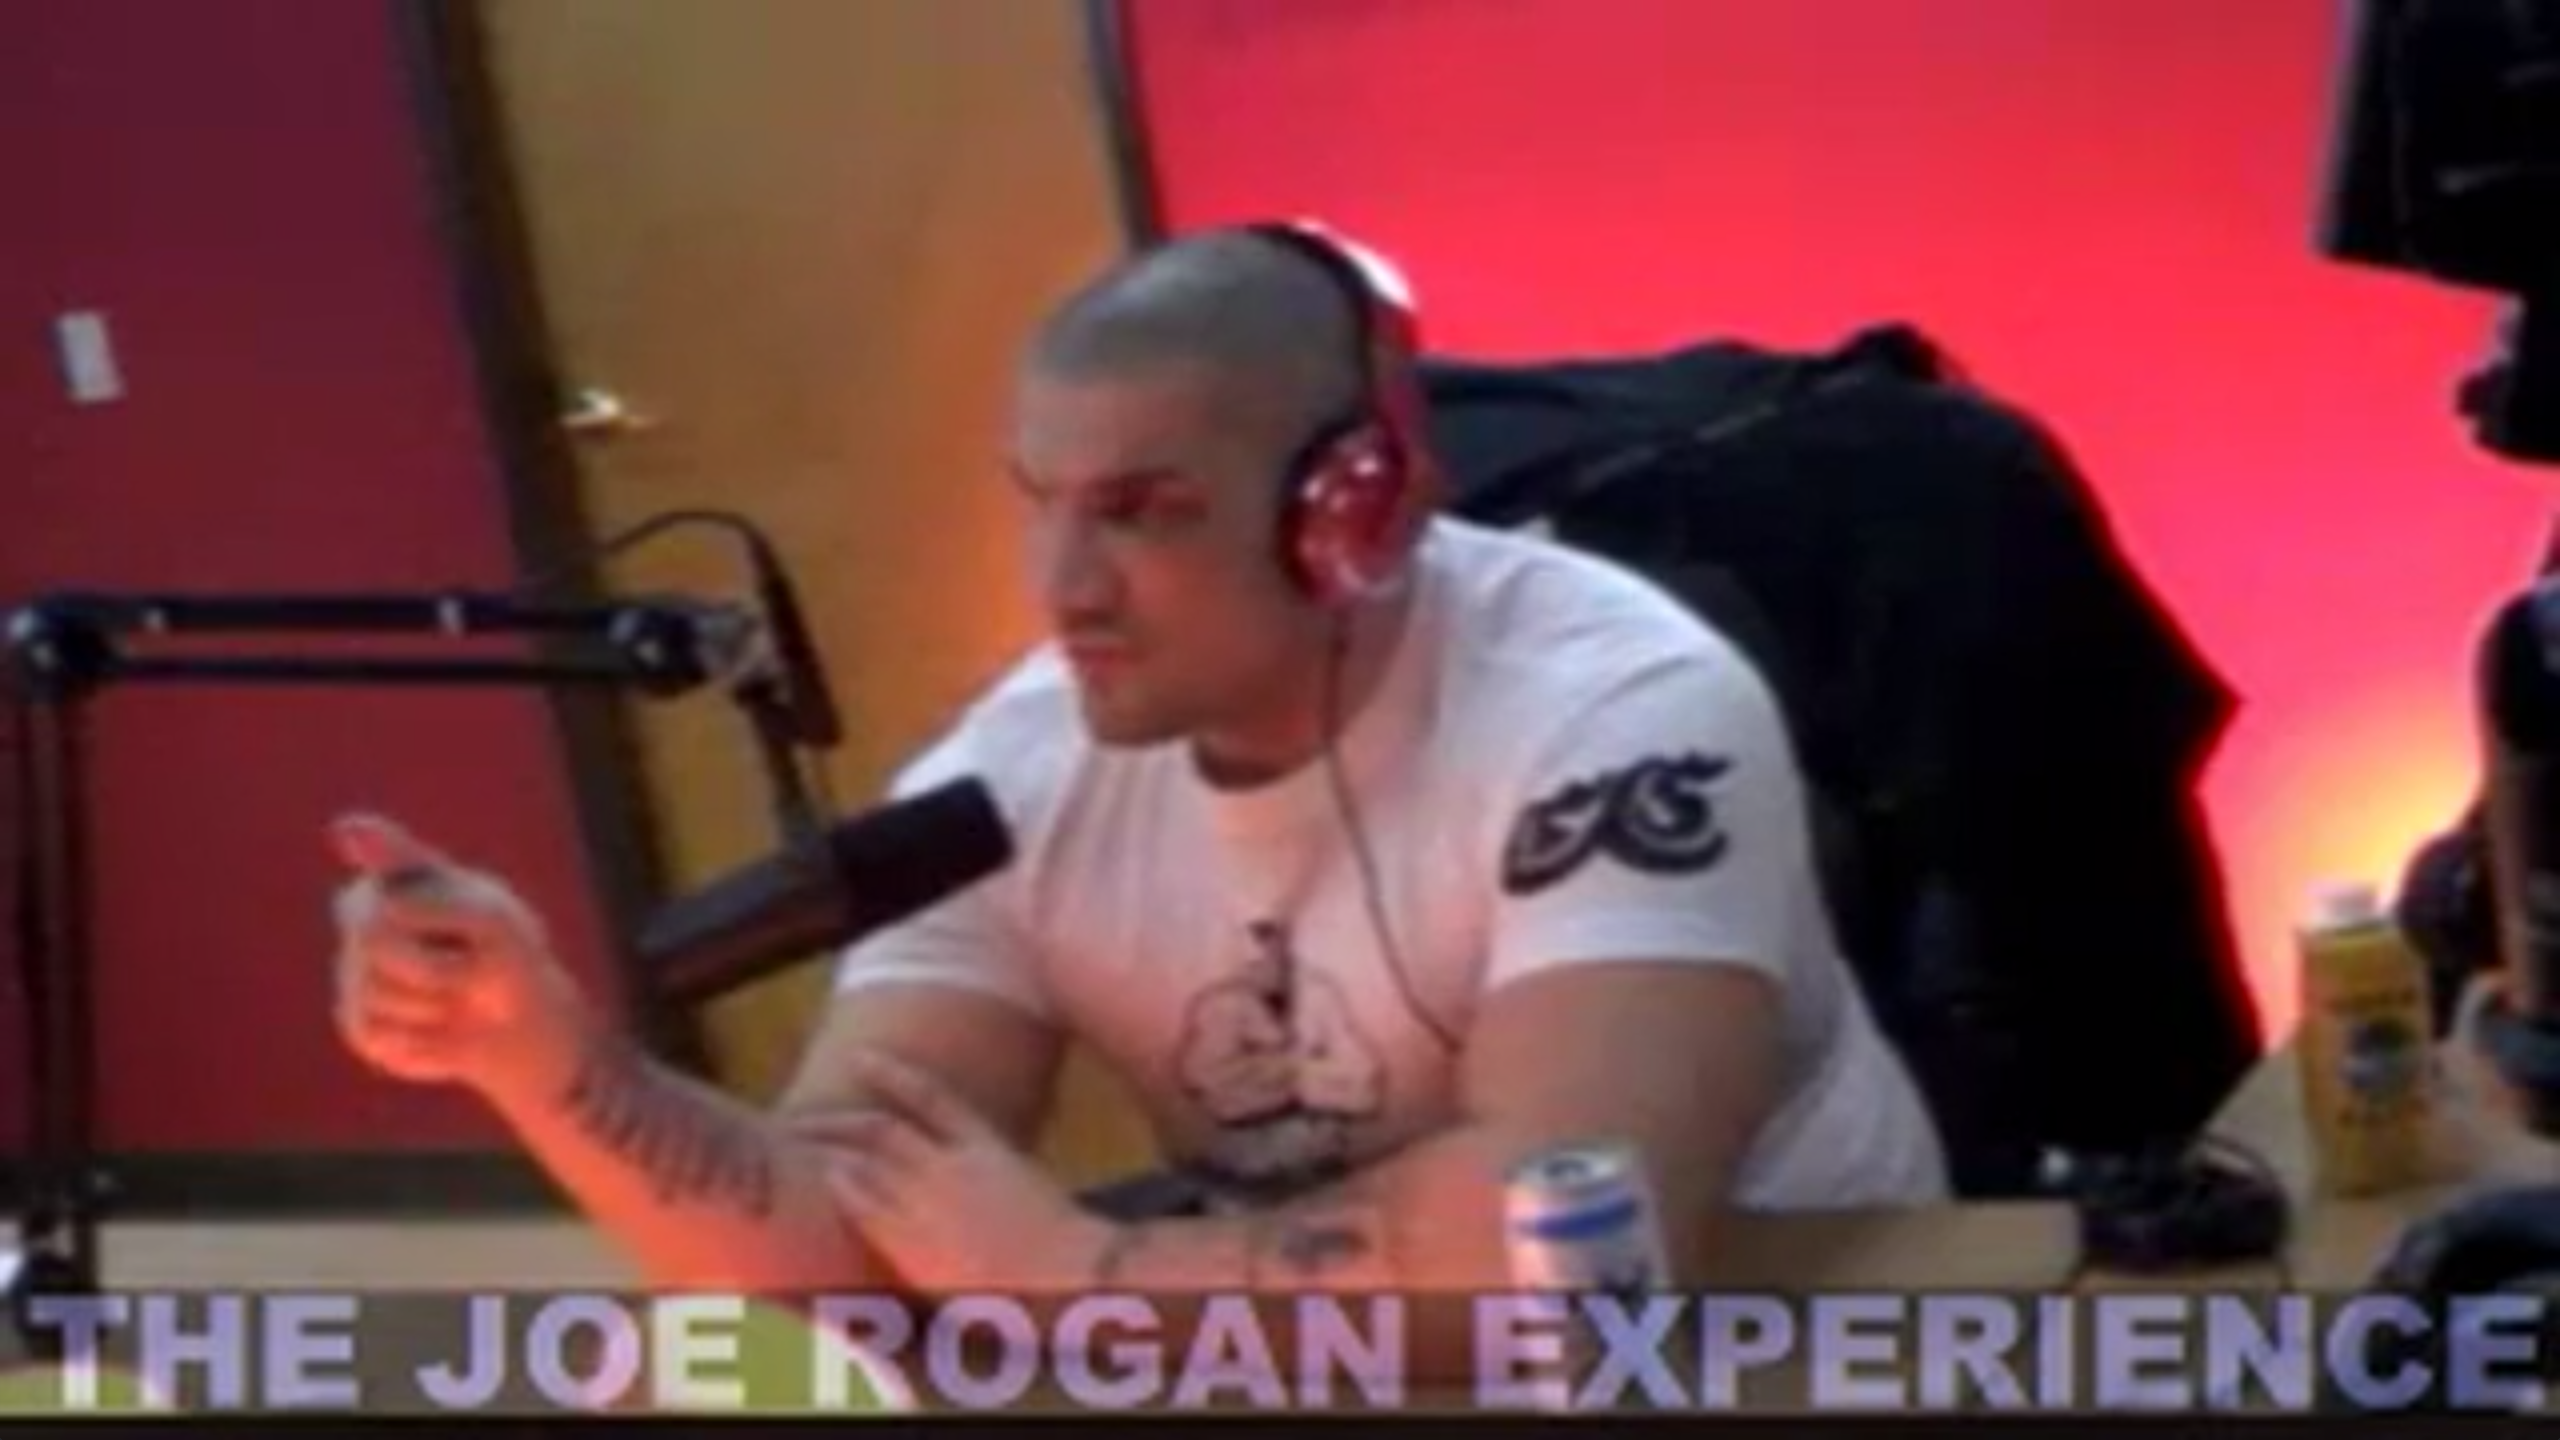 The Joe Rogan Experience #325 - James Thompson